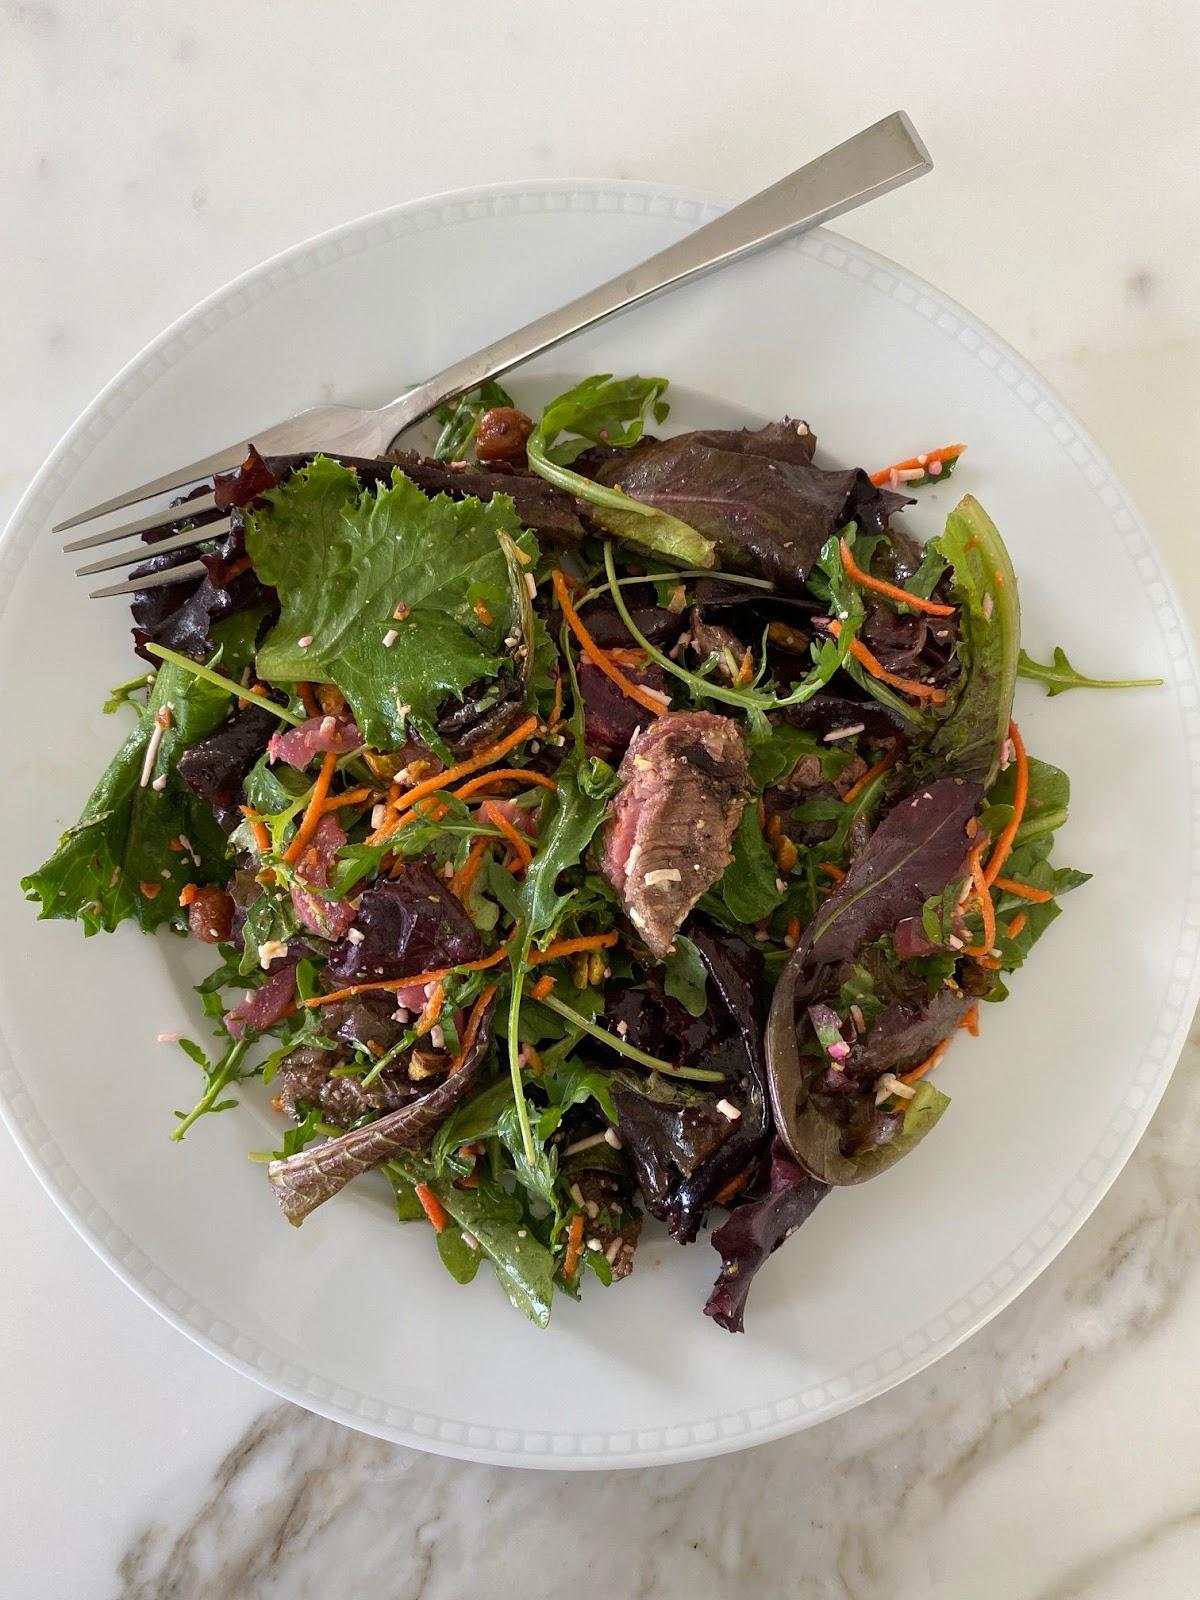 Dietitian Diary: Salad